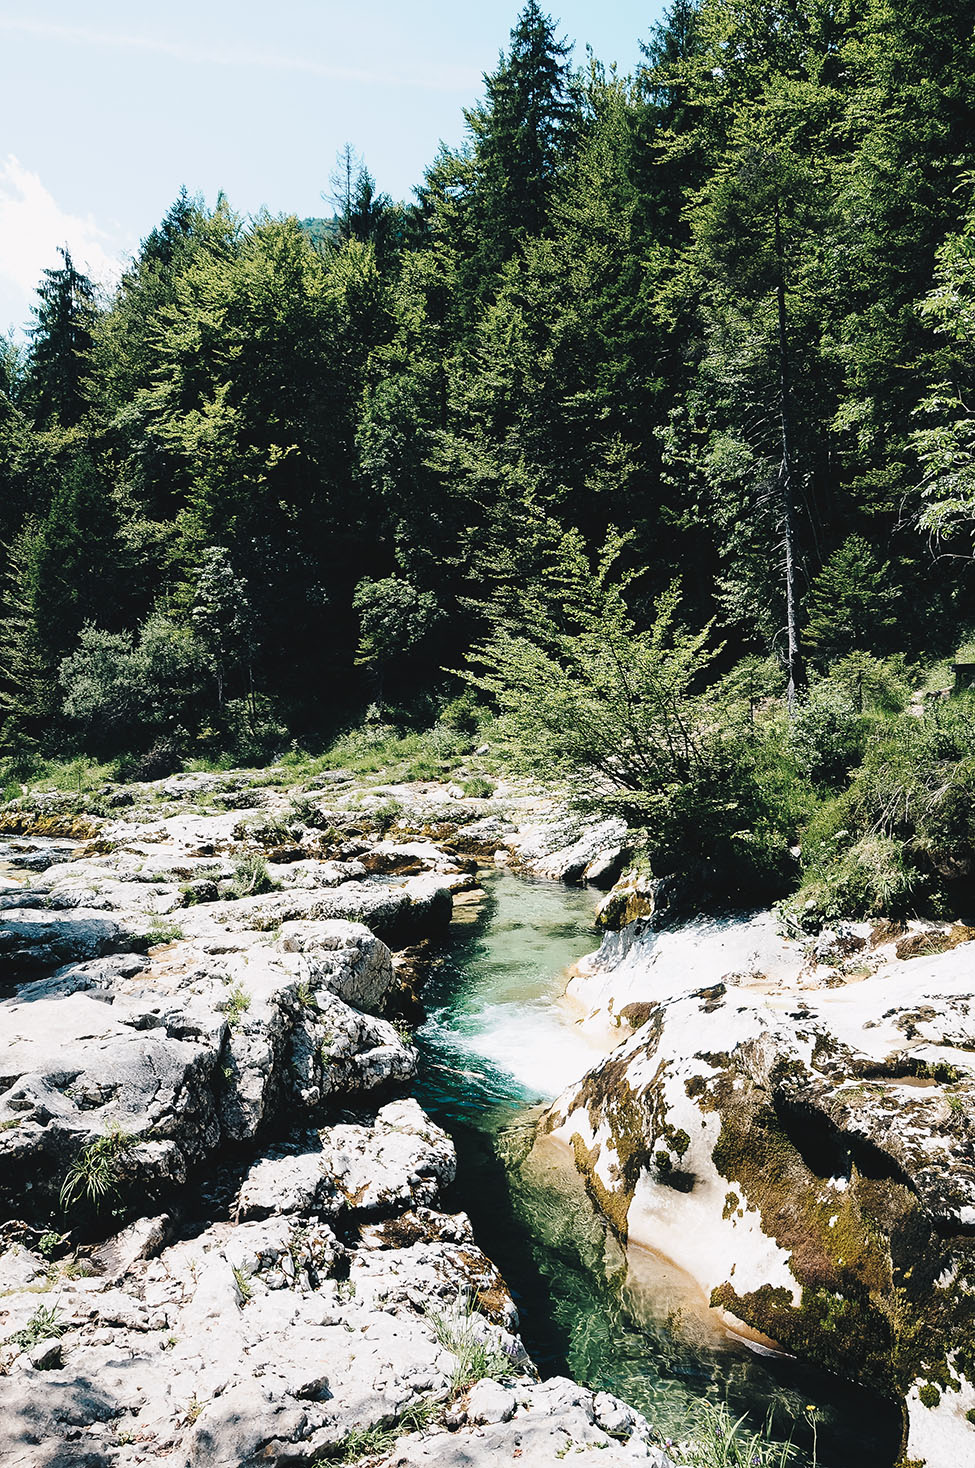 randonnée gorges de la mostnica, autour de bohinj, stara fuzina, slovenie